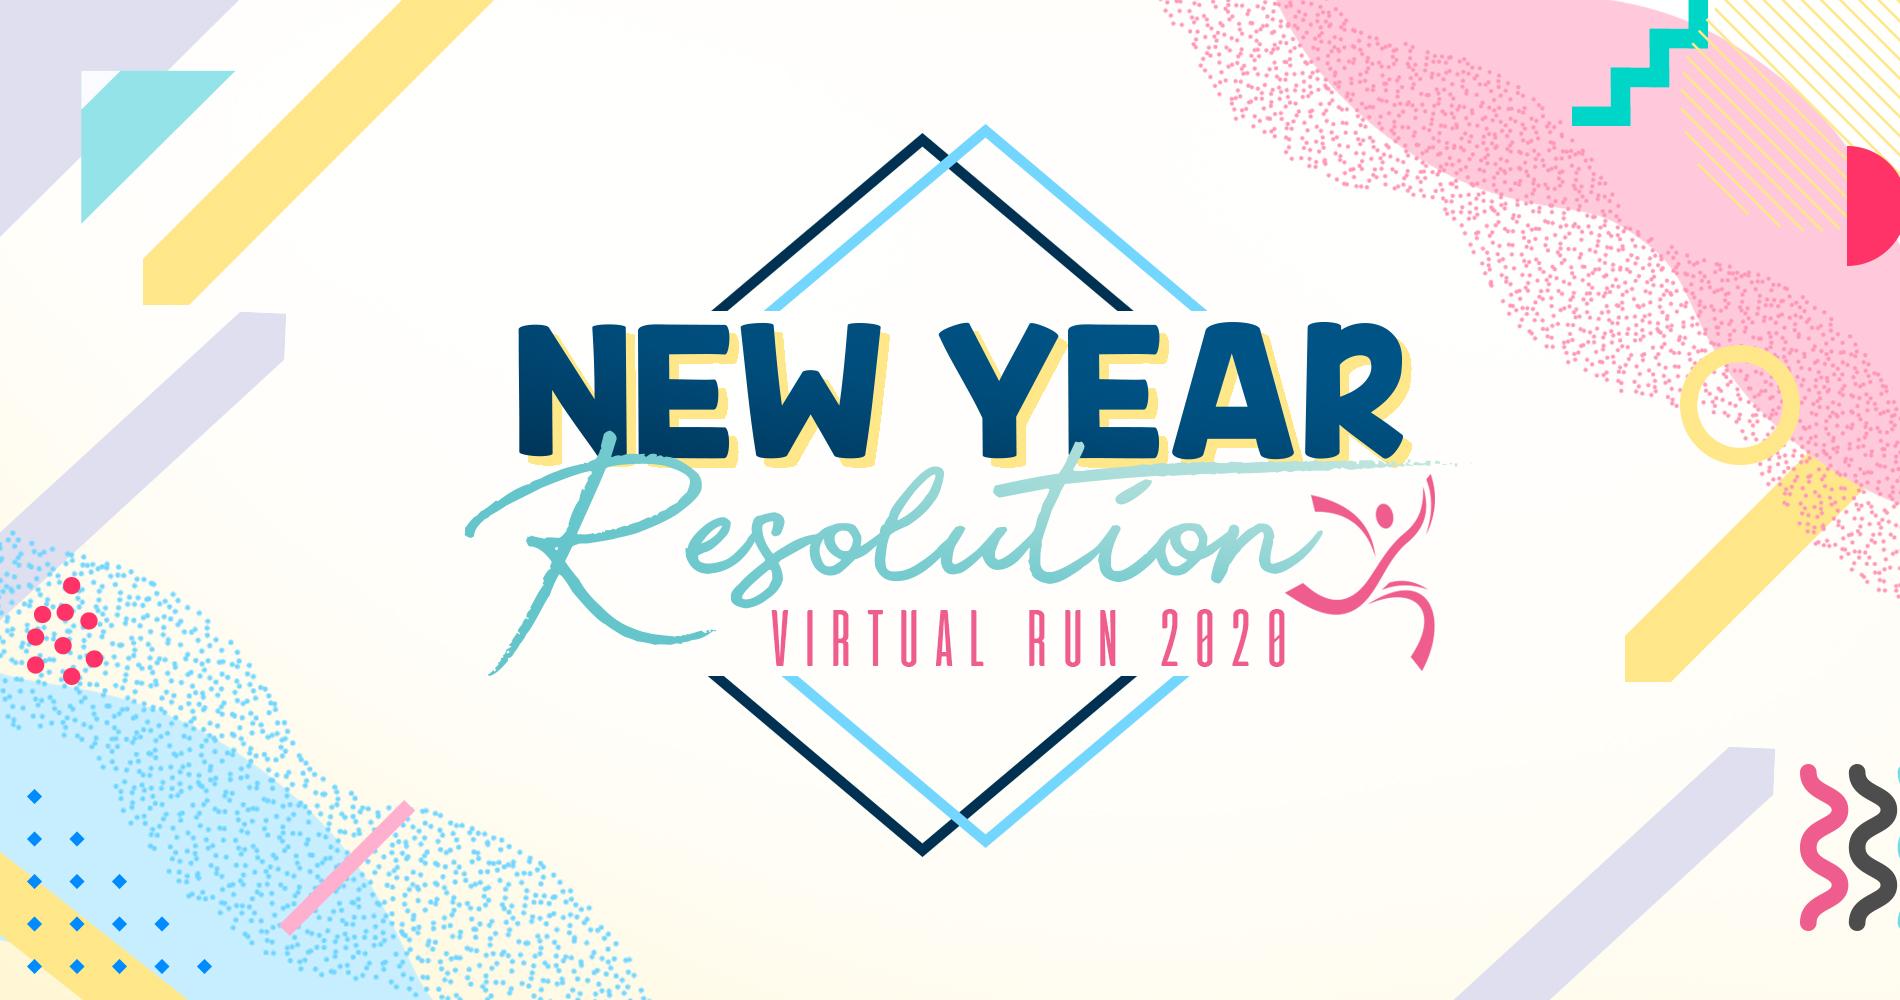 New Years Resolutions 2020.New Year Resolution Virtual Run 2020